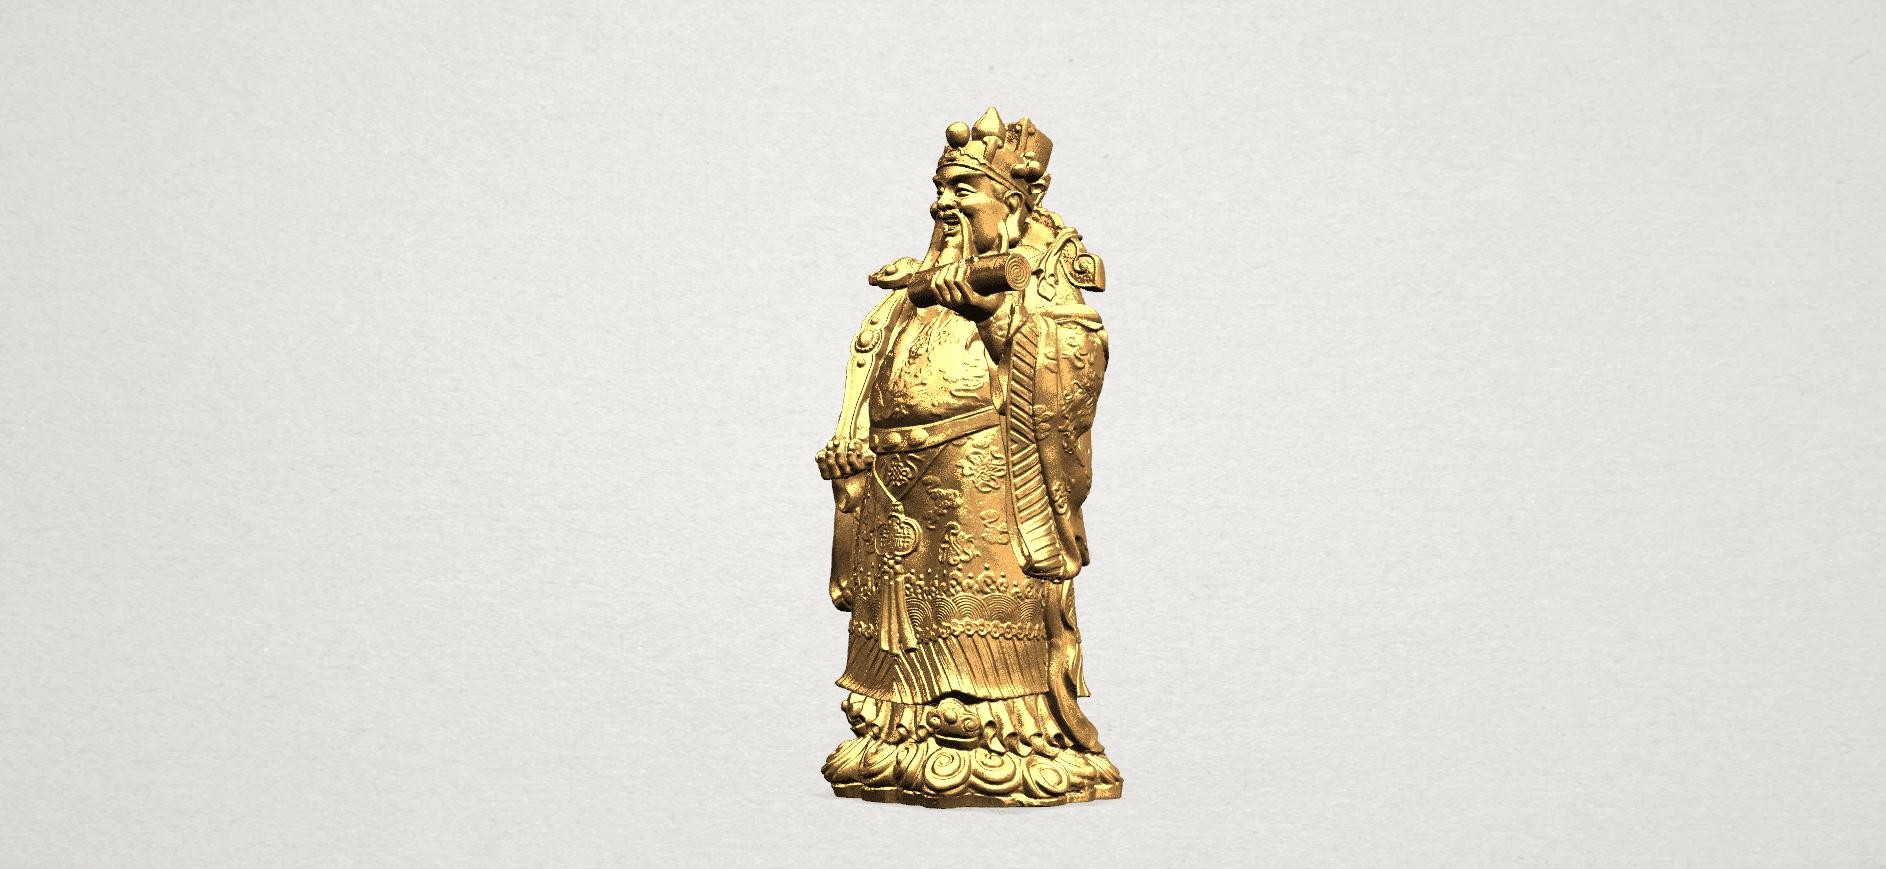 God of Treasure - B02.png Download free STL file God of Treasure • 3D printing model, GeorgesNikkei